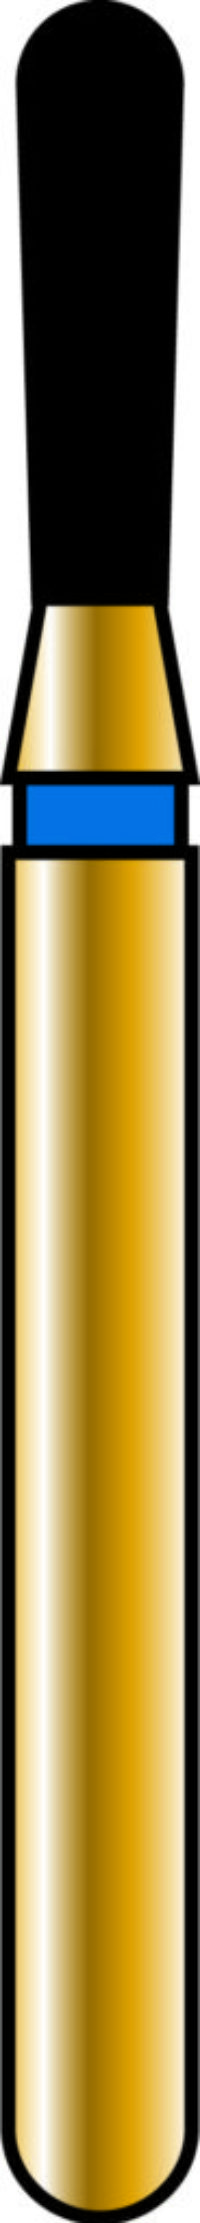 Pear 14-5mm Gold Diamond Bur - Coarse Grit